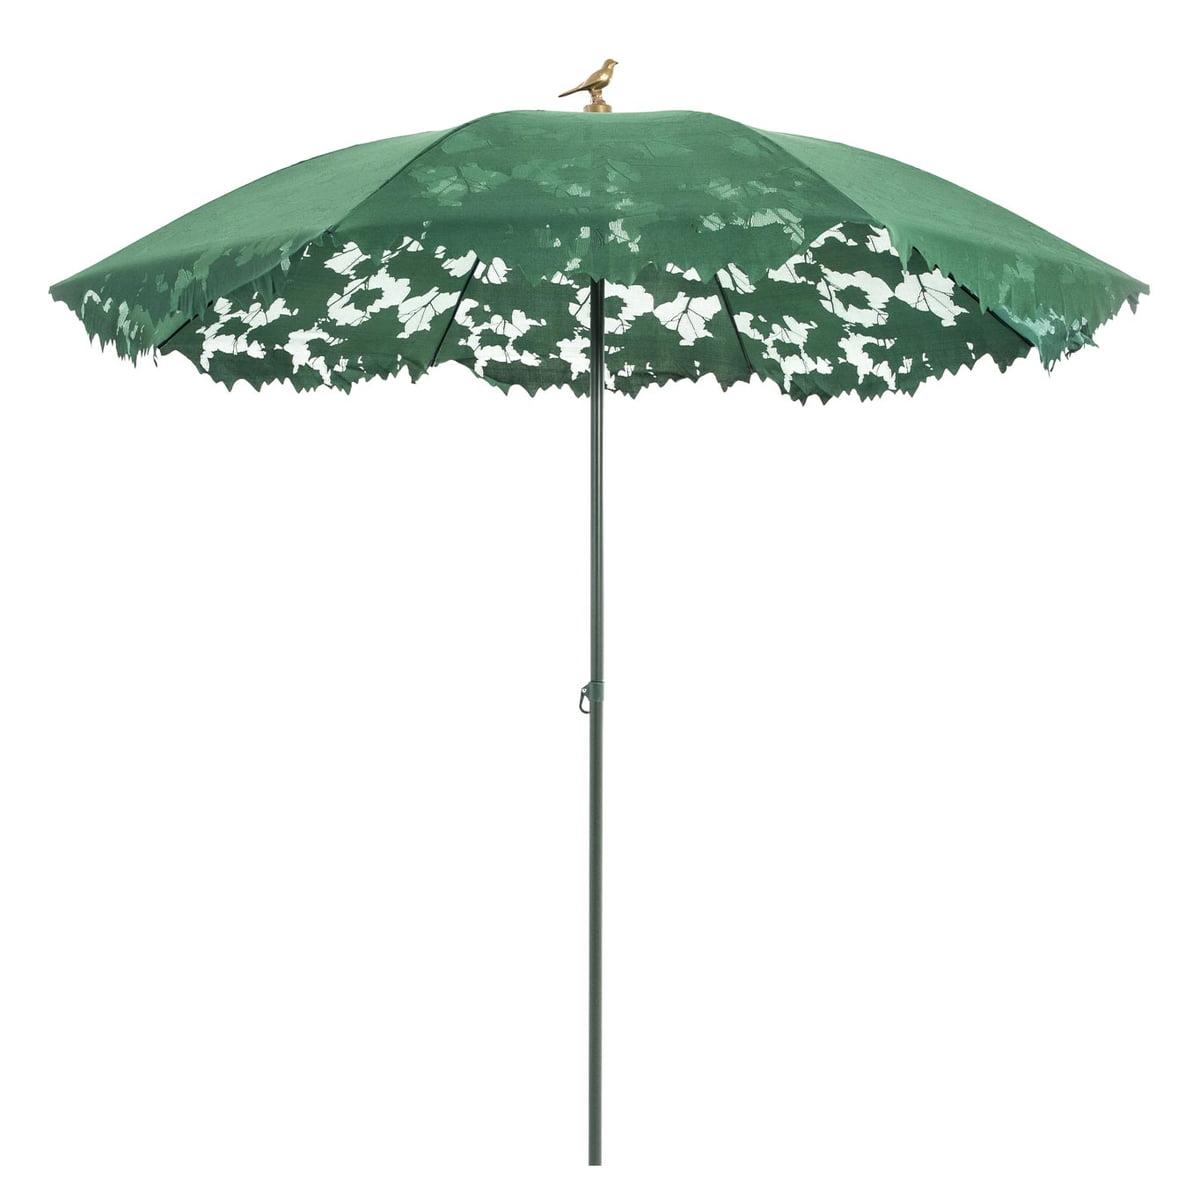 Design Sonnenschirme der shadylace parasol droog im shop